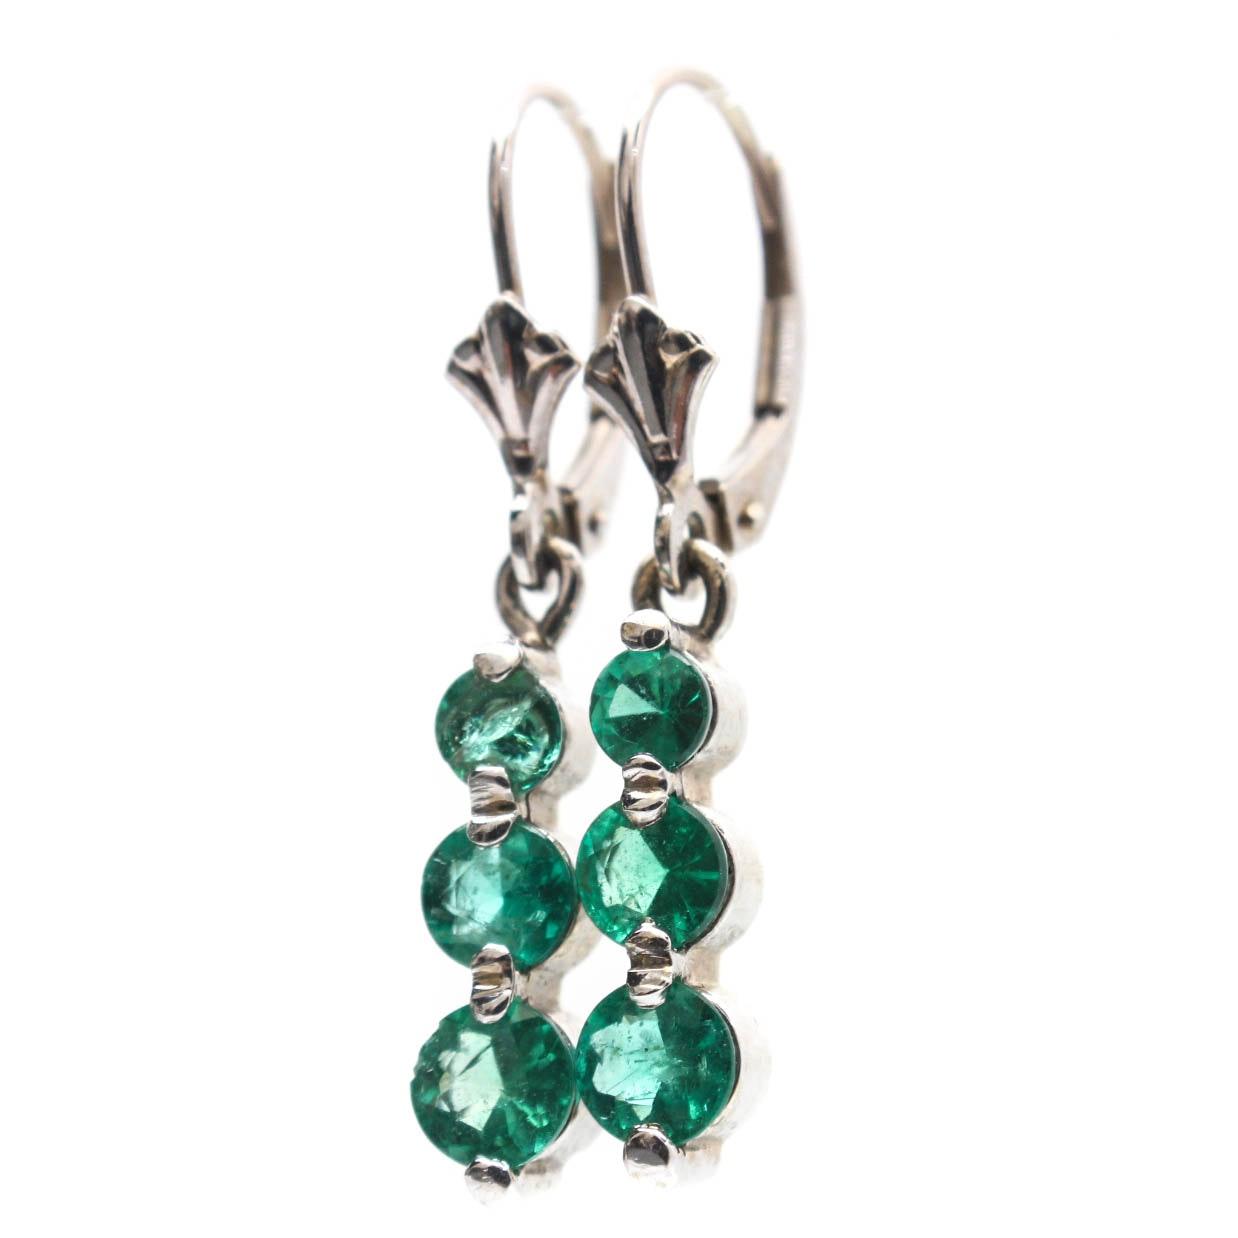 14K Yellow Gold Emerald Dangle Earrings